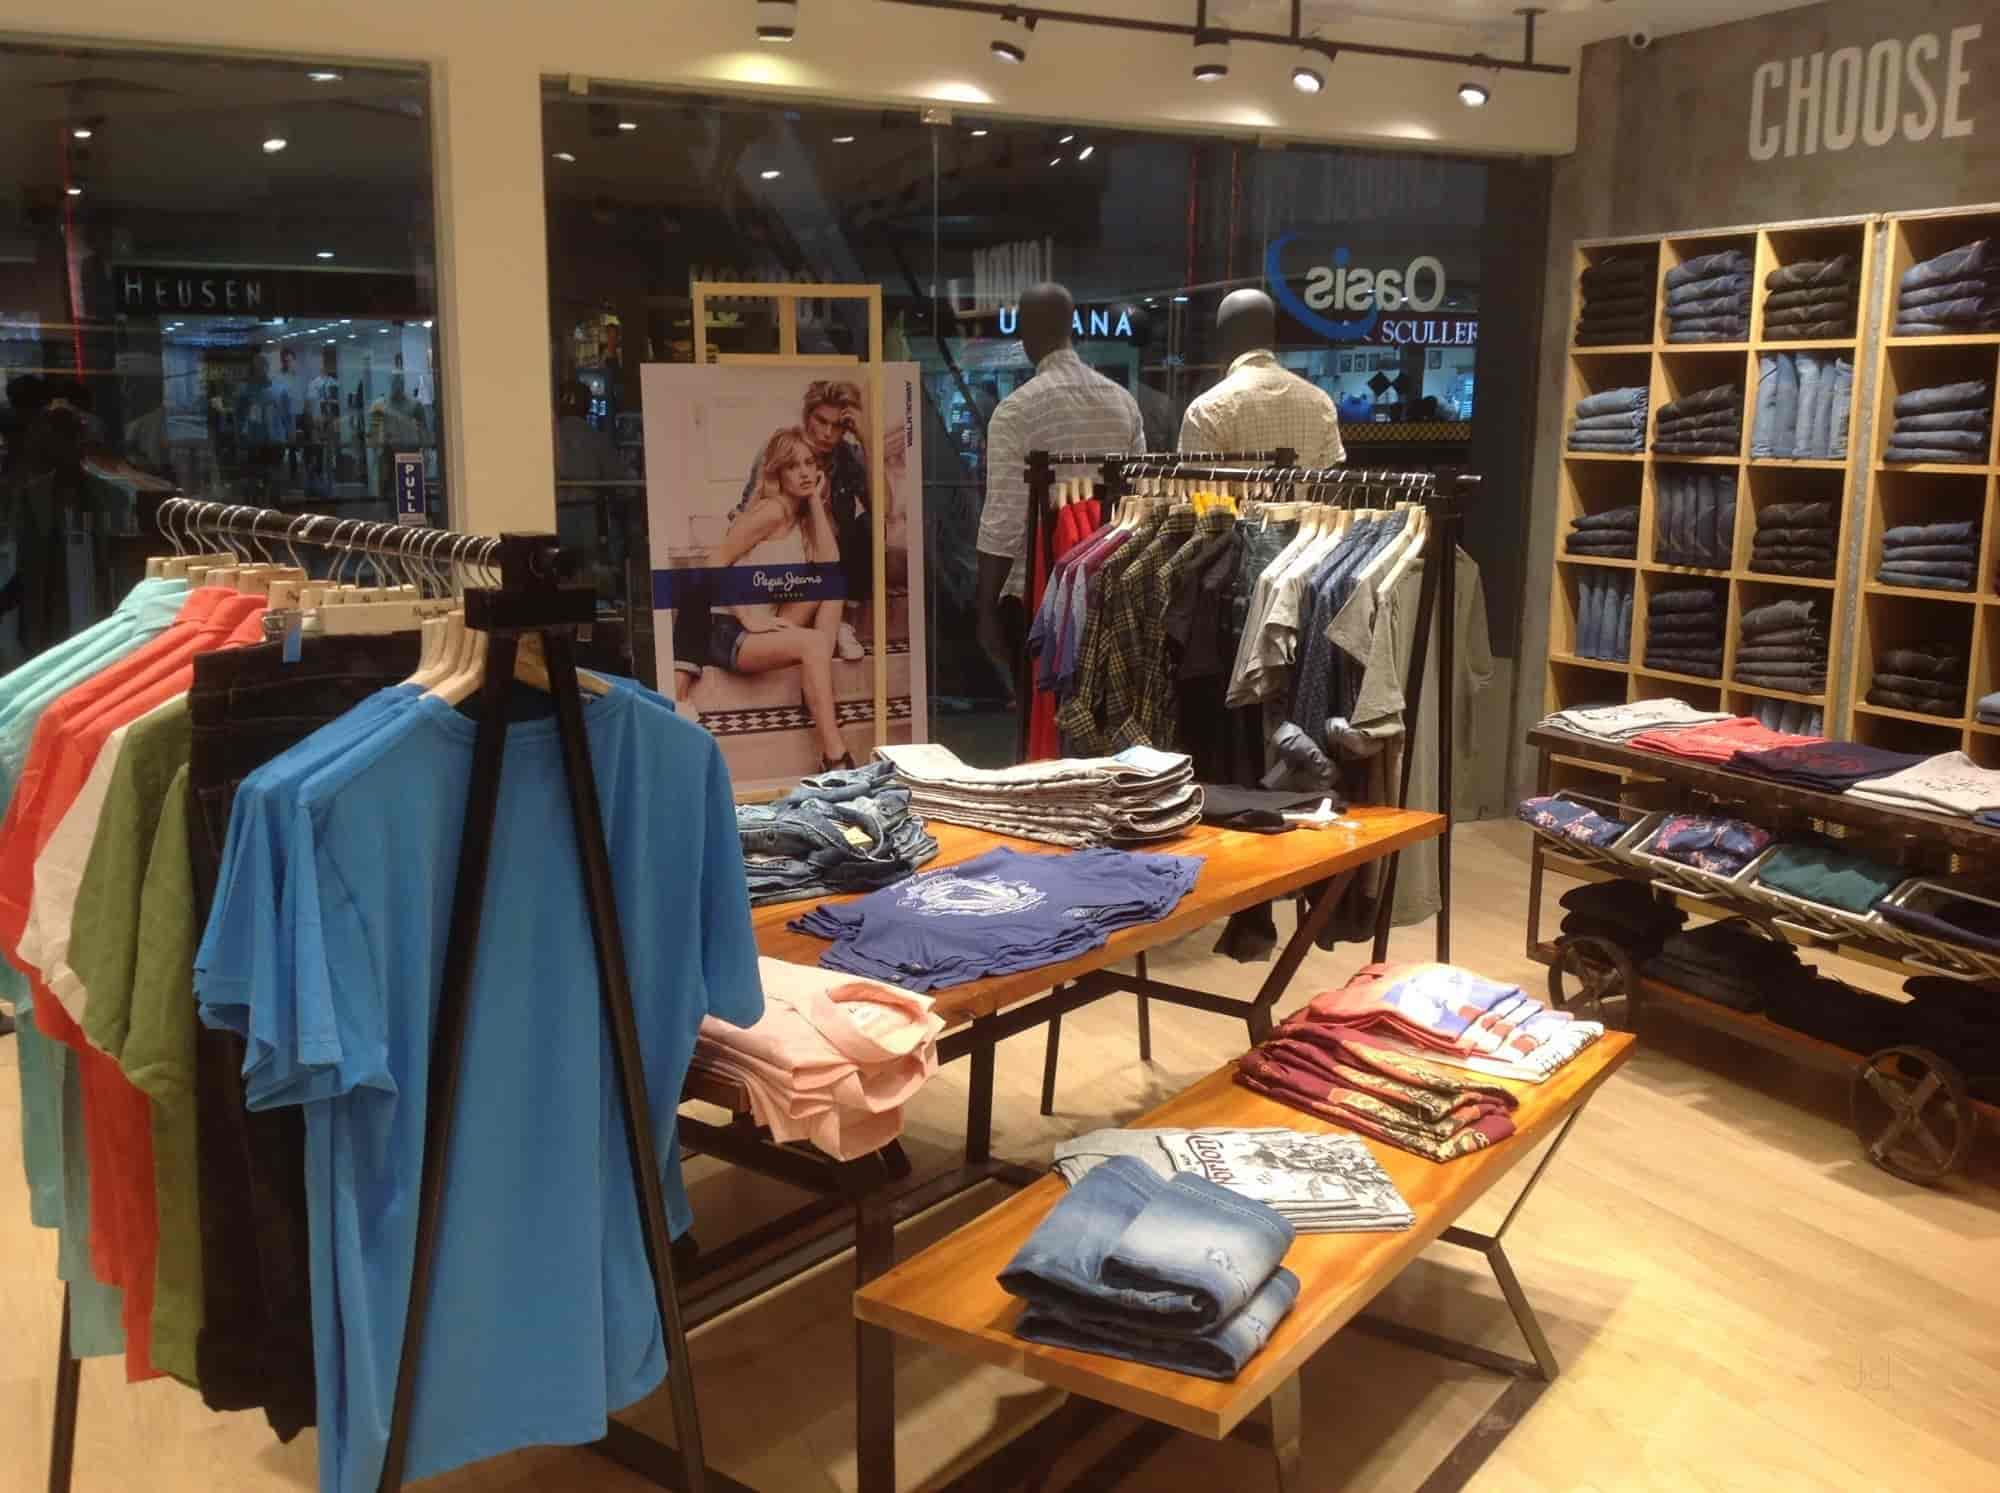 nuovi stili più popolare design unico Pepe Jeans Showroom Photos, Calicut City, Kozhikode ...